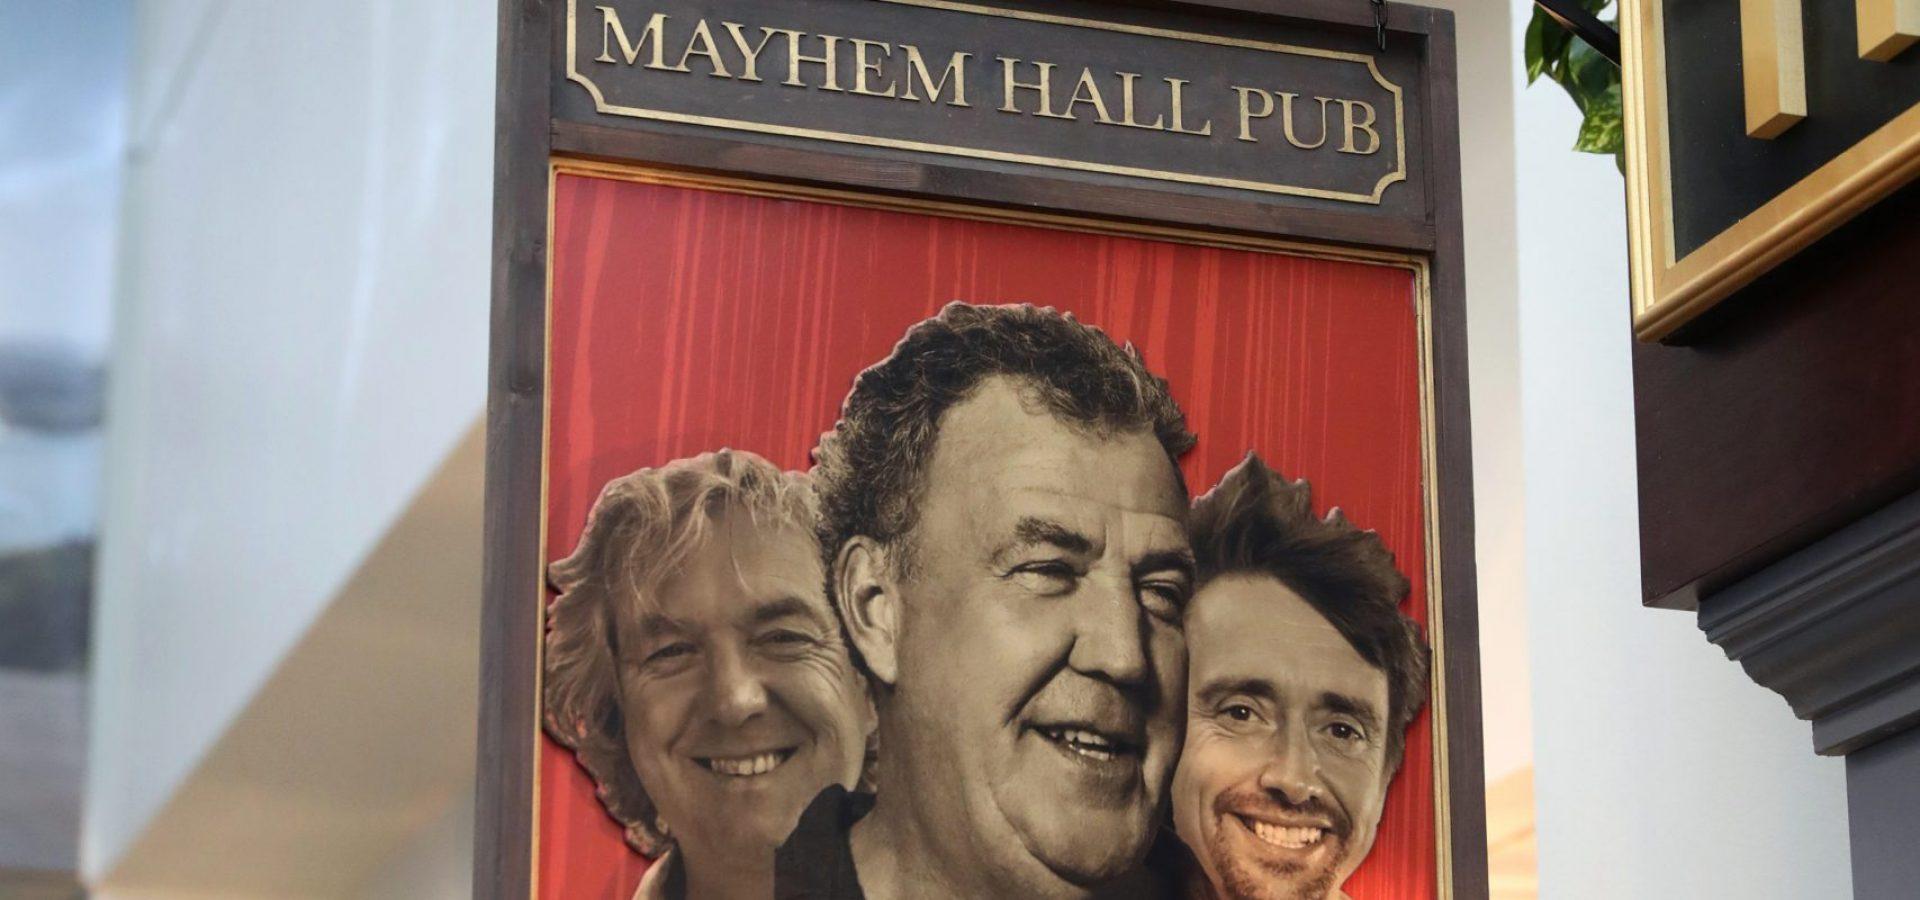 Grand Tour Mayhem Hall Pub Sign